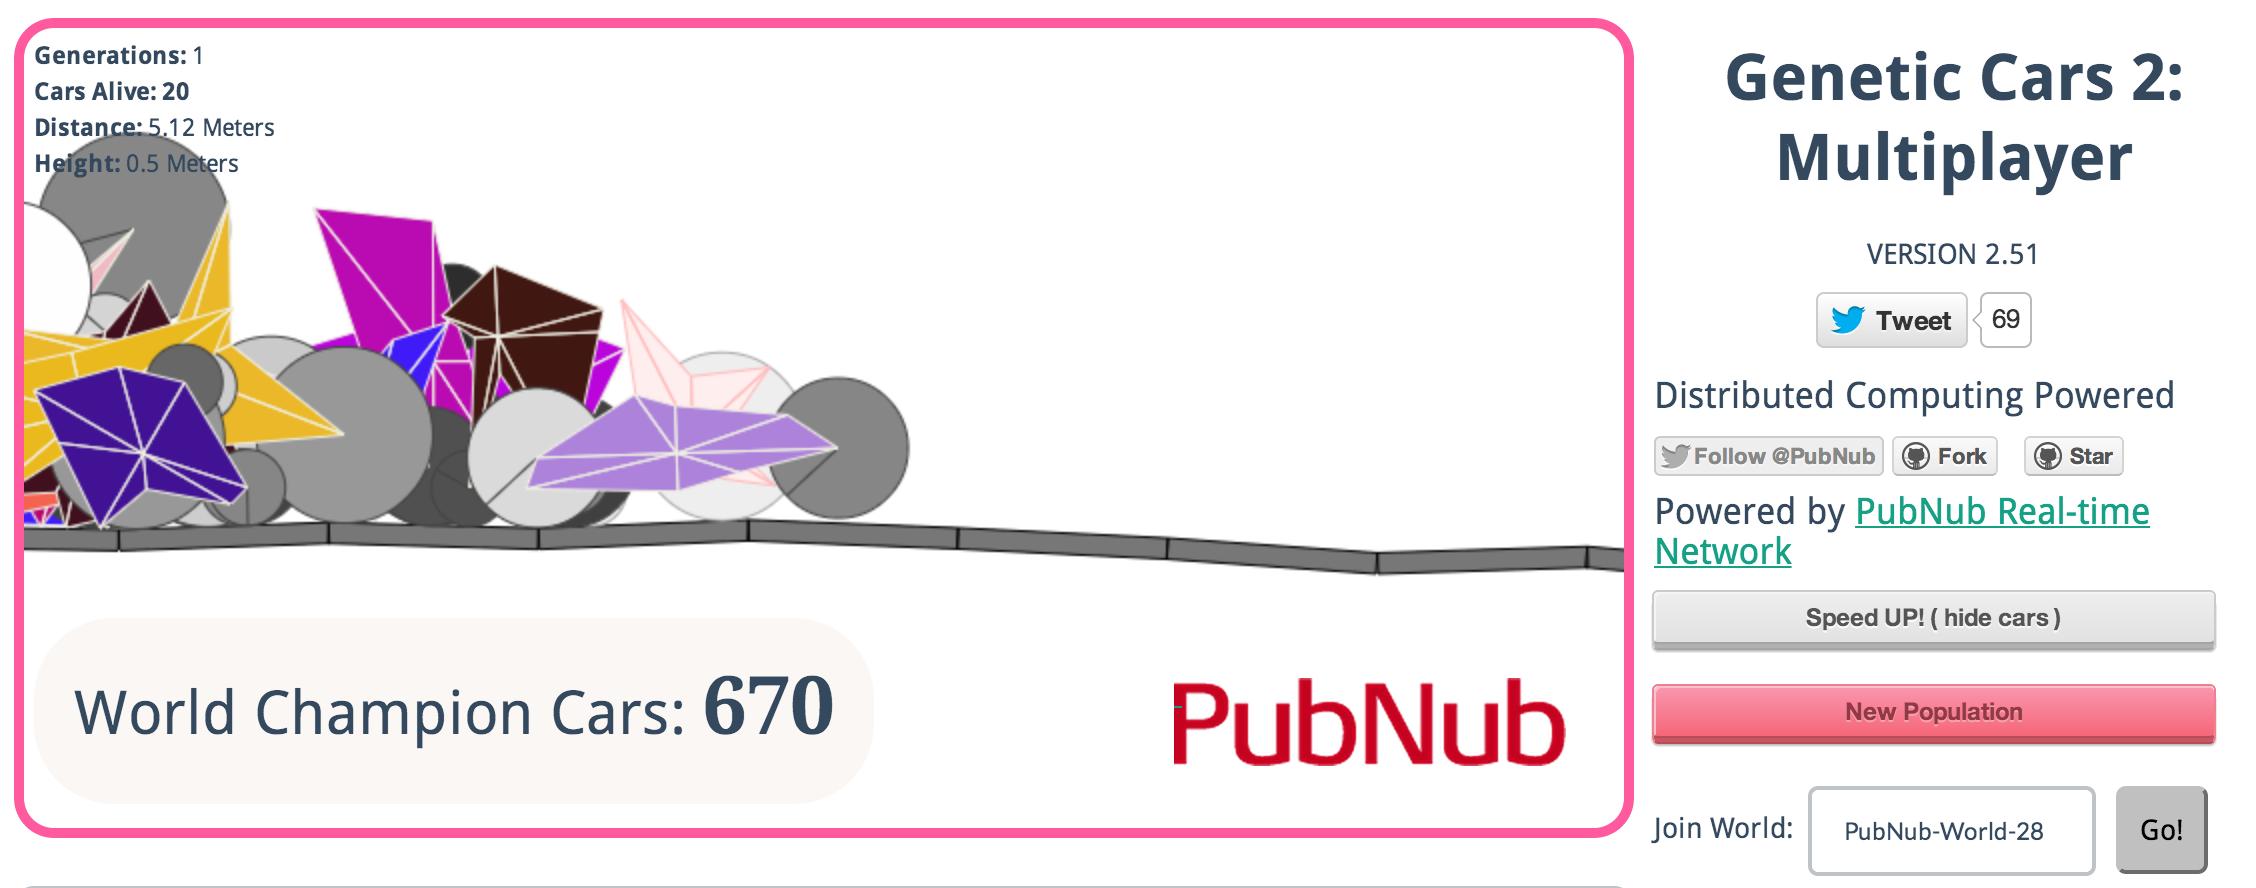 Multiplayer Genetic Cars PubNub